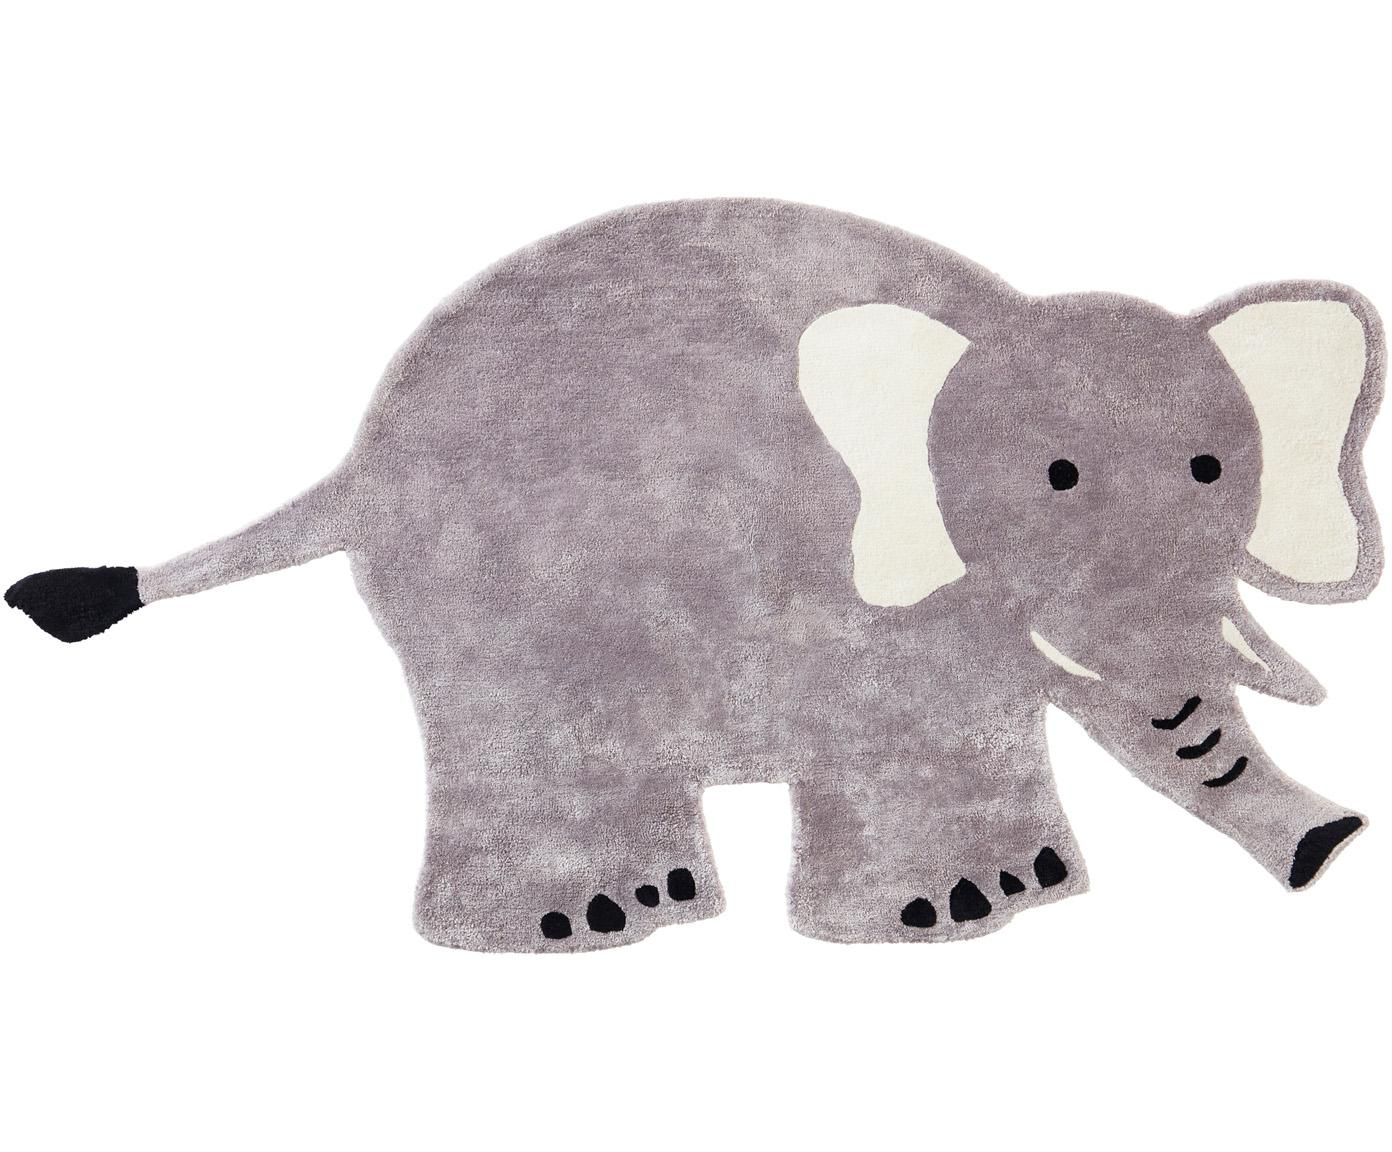 Viscose vloerkleed Ellie Elephant, 100% viscose, 4600 g/m², Grijs, zwart, wit, B 100 x L 180 cm (maat S)